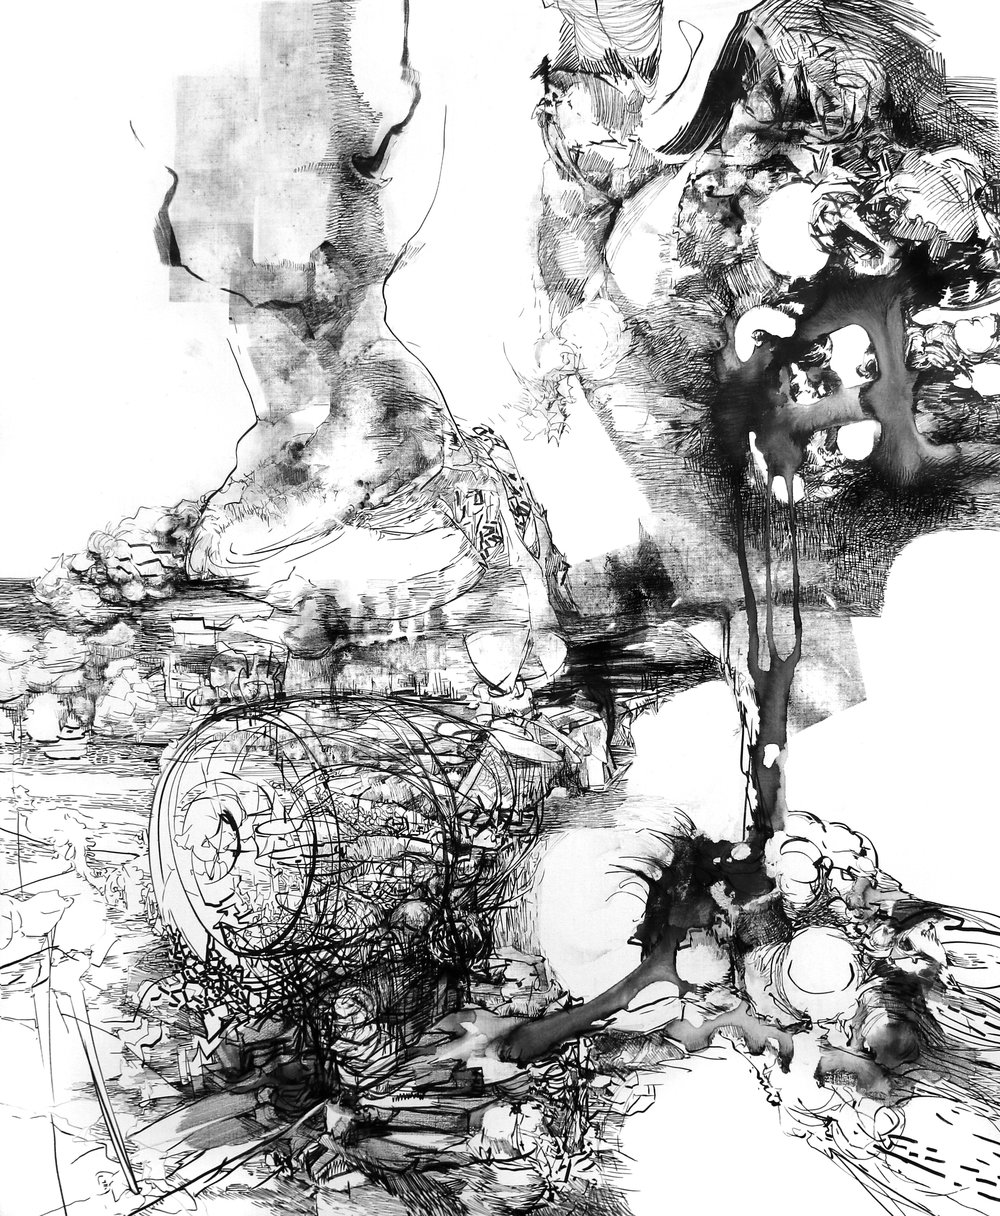 Sabine Banovic, Sichtflug, 2017,  Tusche & Marker auf Leinwand, 170 x 140 cm